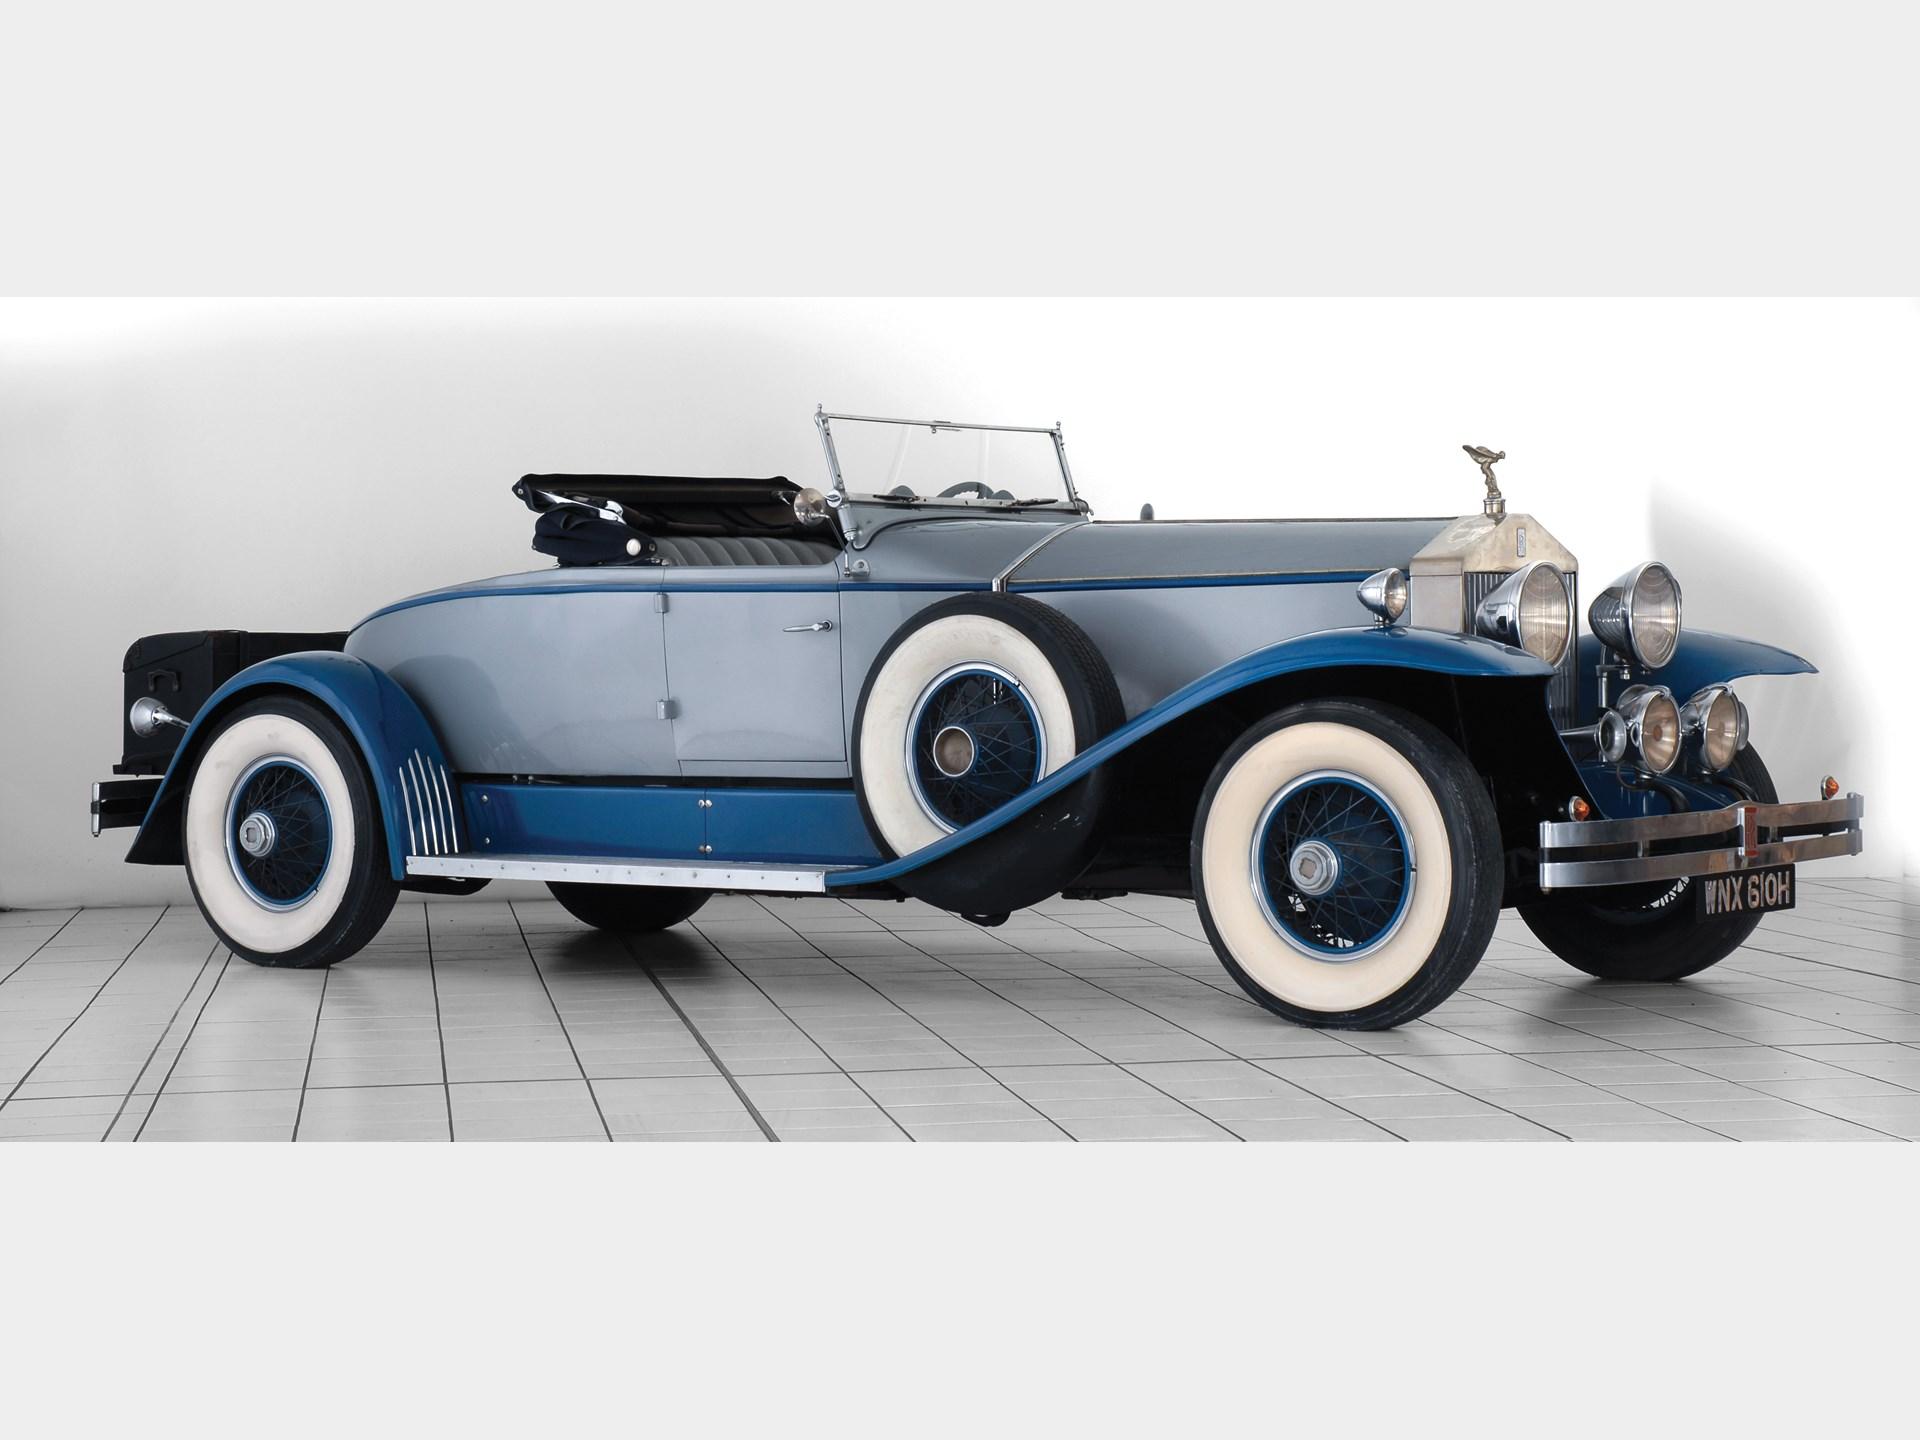 RM Sotheby's - 1926 Rolls-Royce 40/50 hp Silver Ghost Boat ...